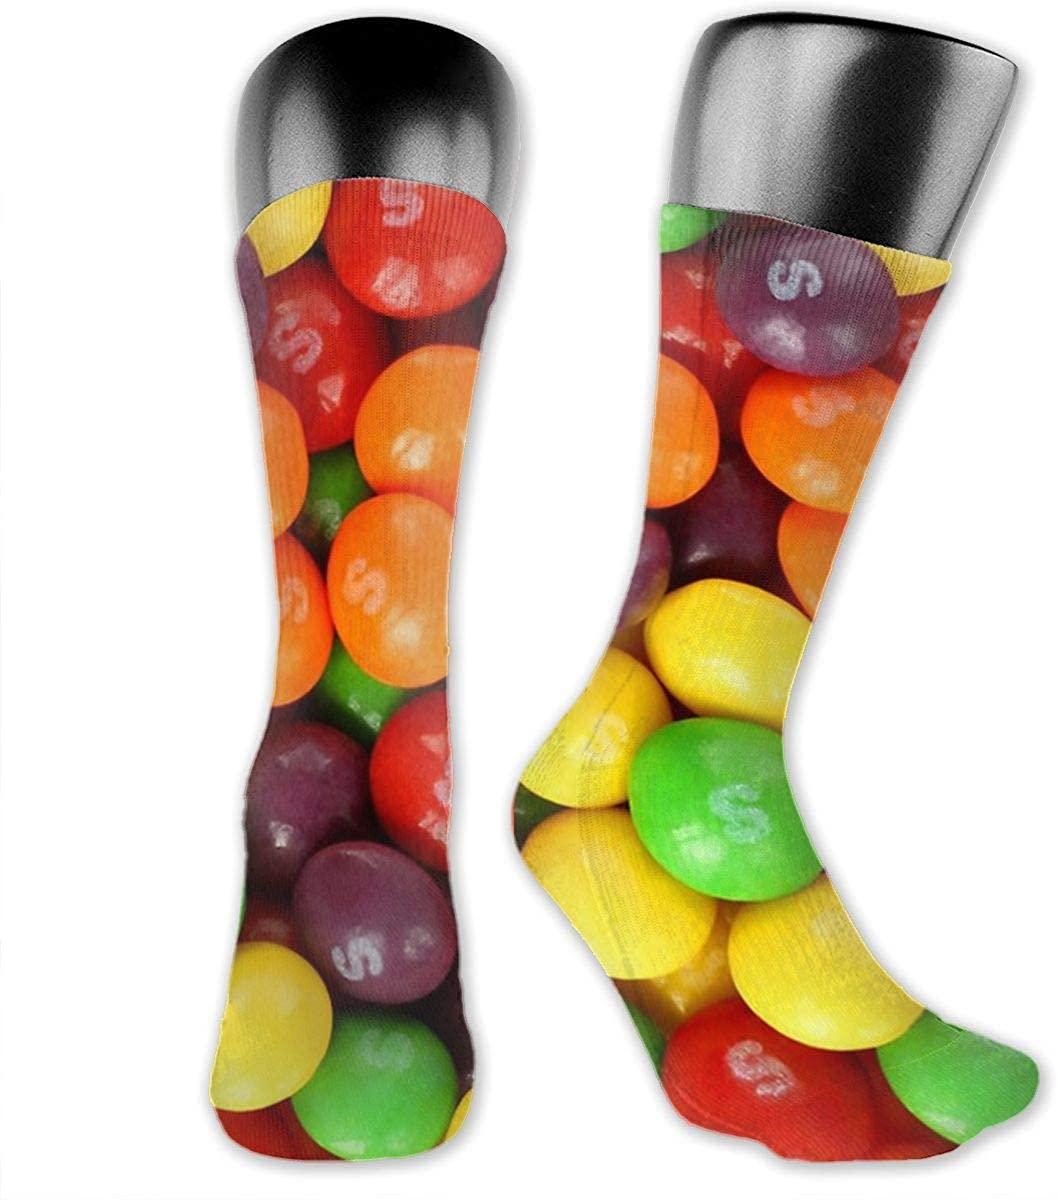 Unisex Crazy Funny Skittles Socks Colorful Running Medica Socks Novelty Casual Crew Socks